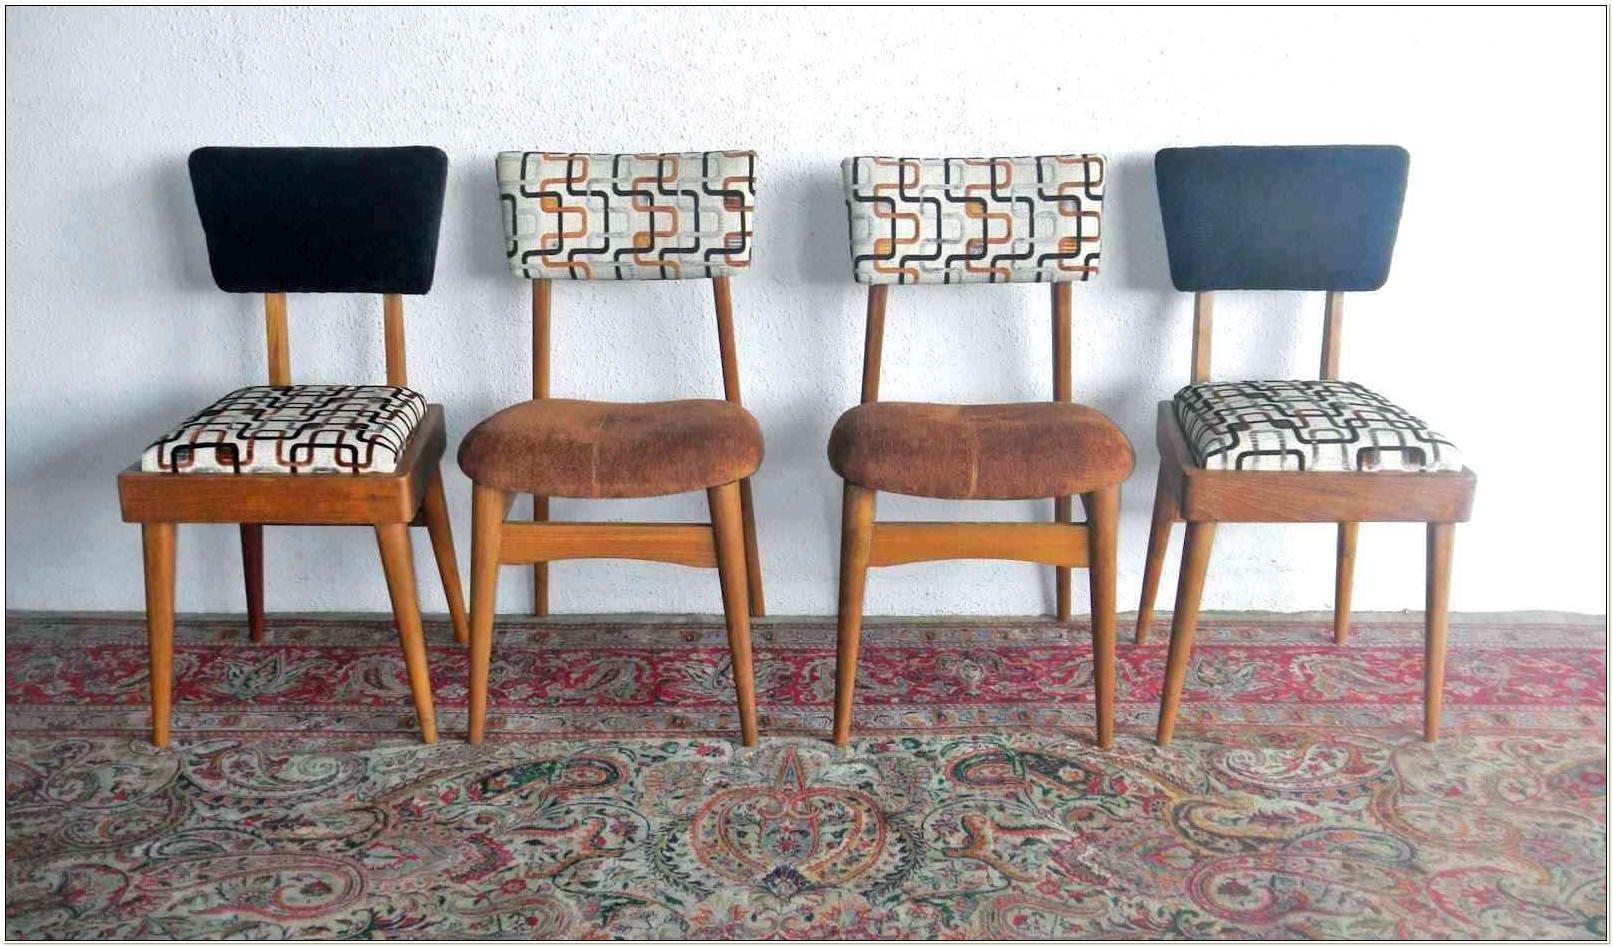 Ebay Australia Retro Dining Chairs